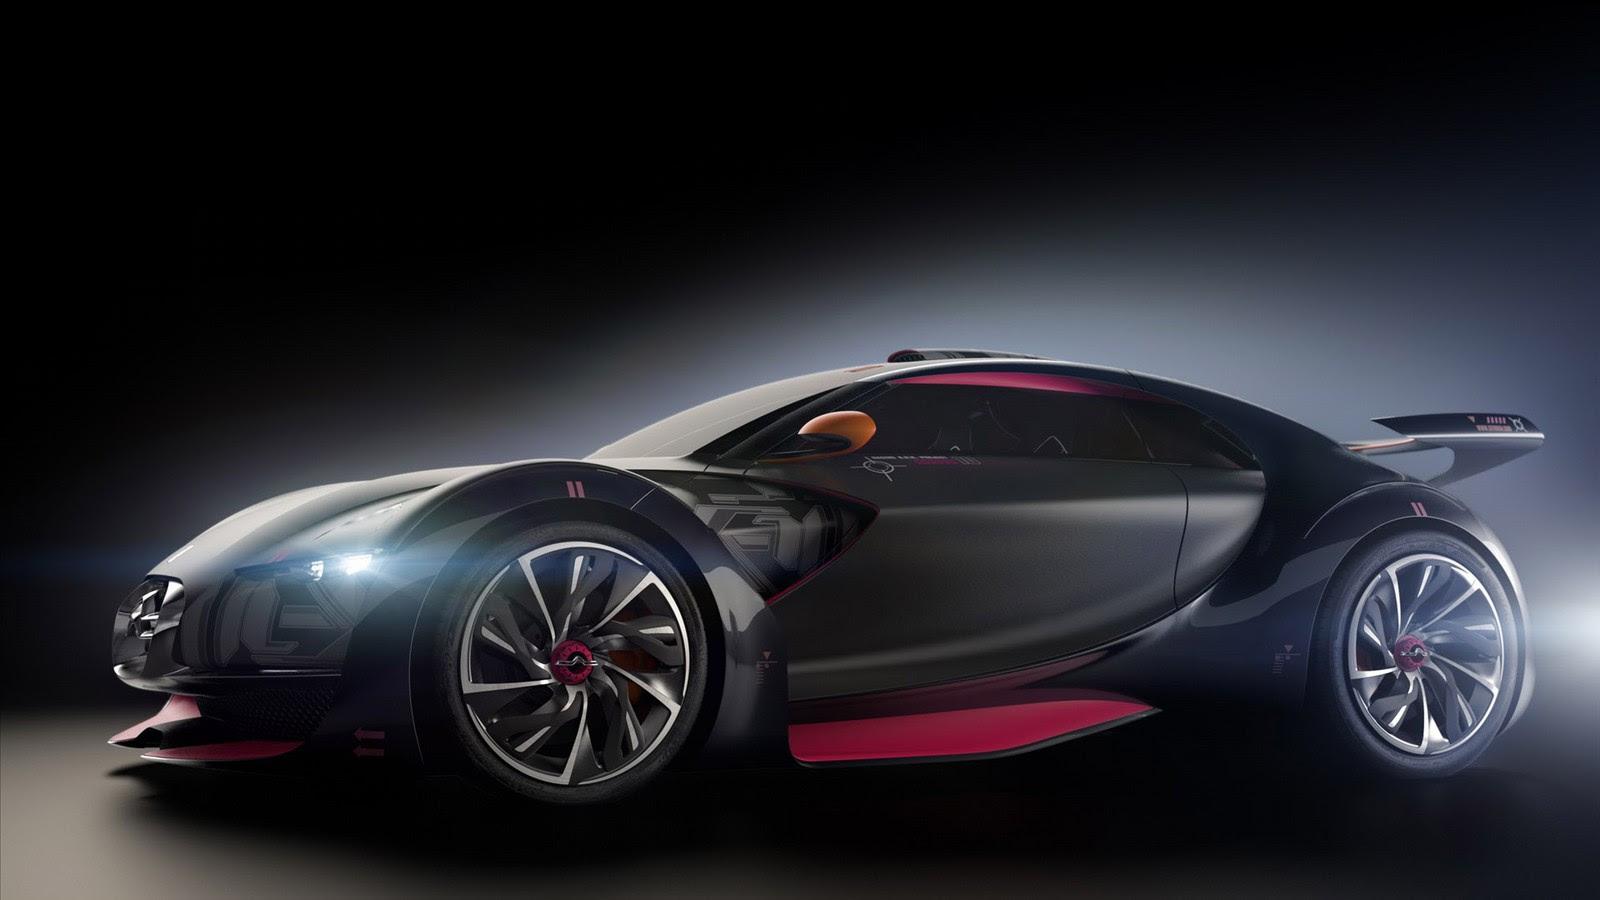 Black Sports Car Wal